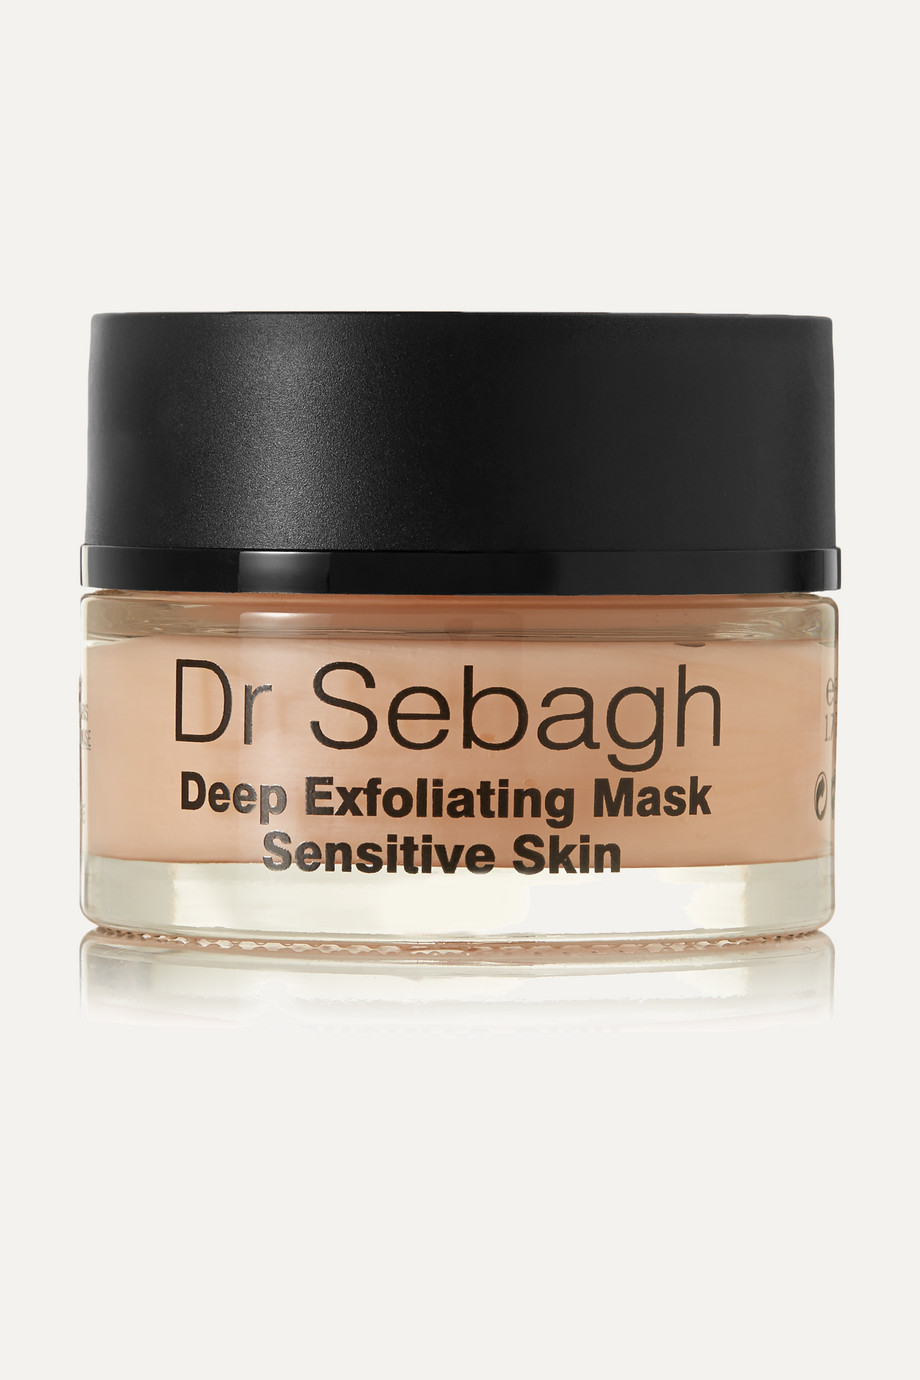 Dr Sebagh Deep Exfoliating Mask Sensitive Skin, 50 ml – Peelingmaske